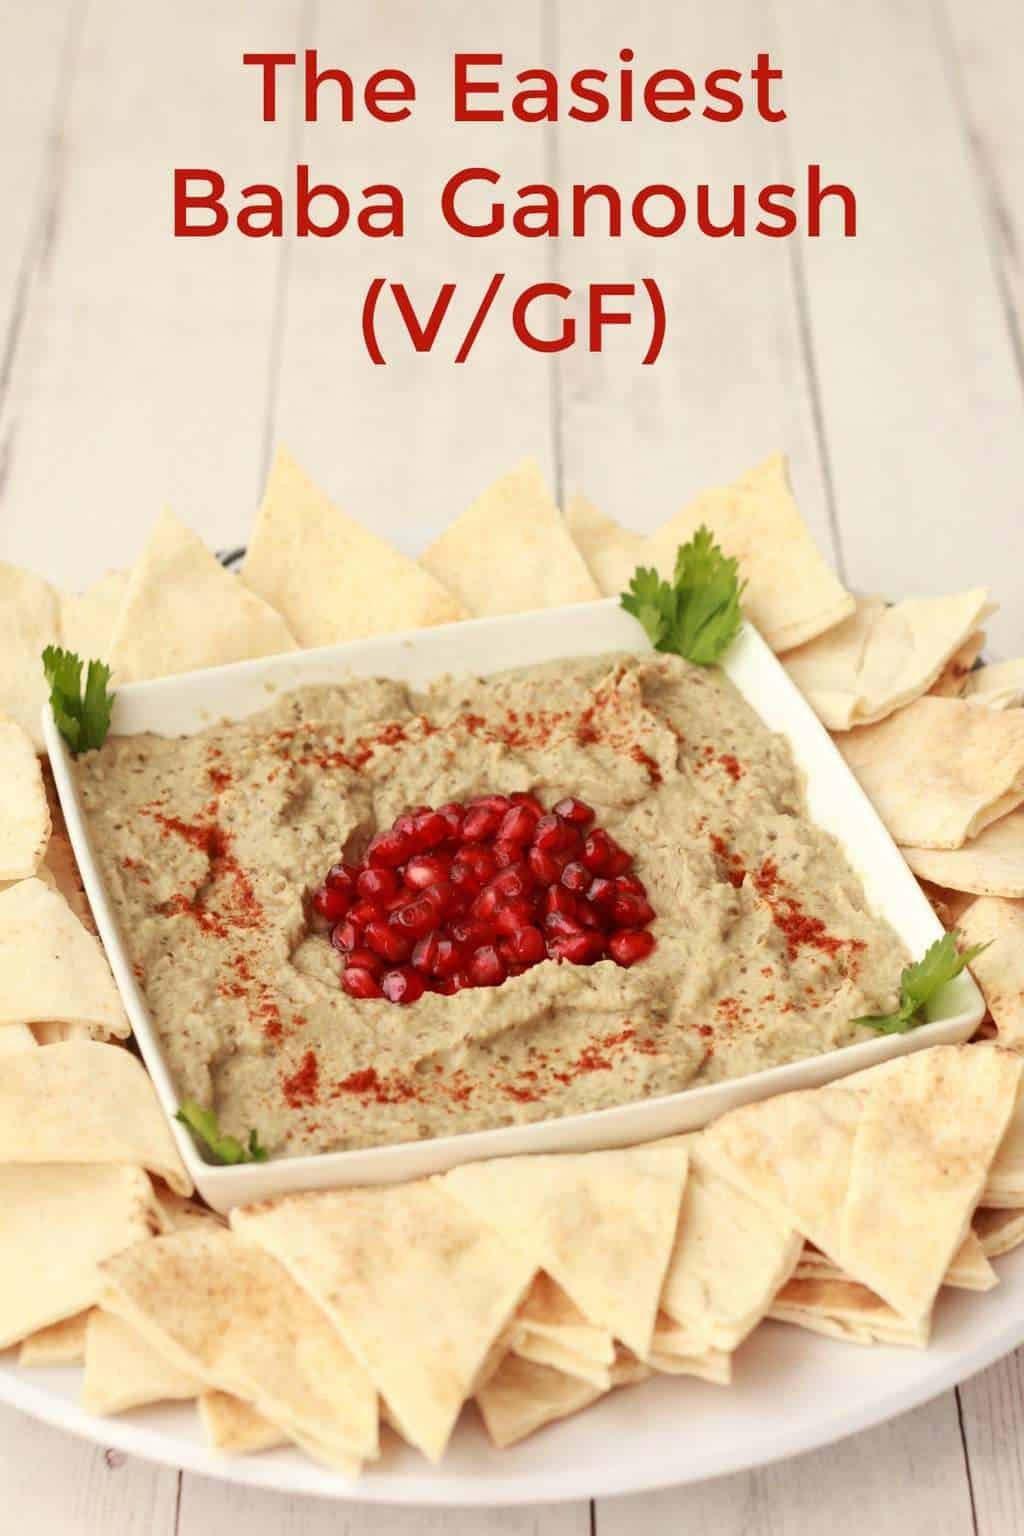 The Easiest Baba Ganoush #vegan #glutenfree #babaganoush #lovingitvegan #middleeastern #moutabel